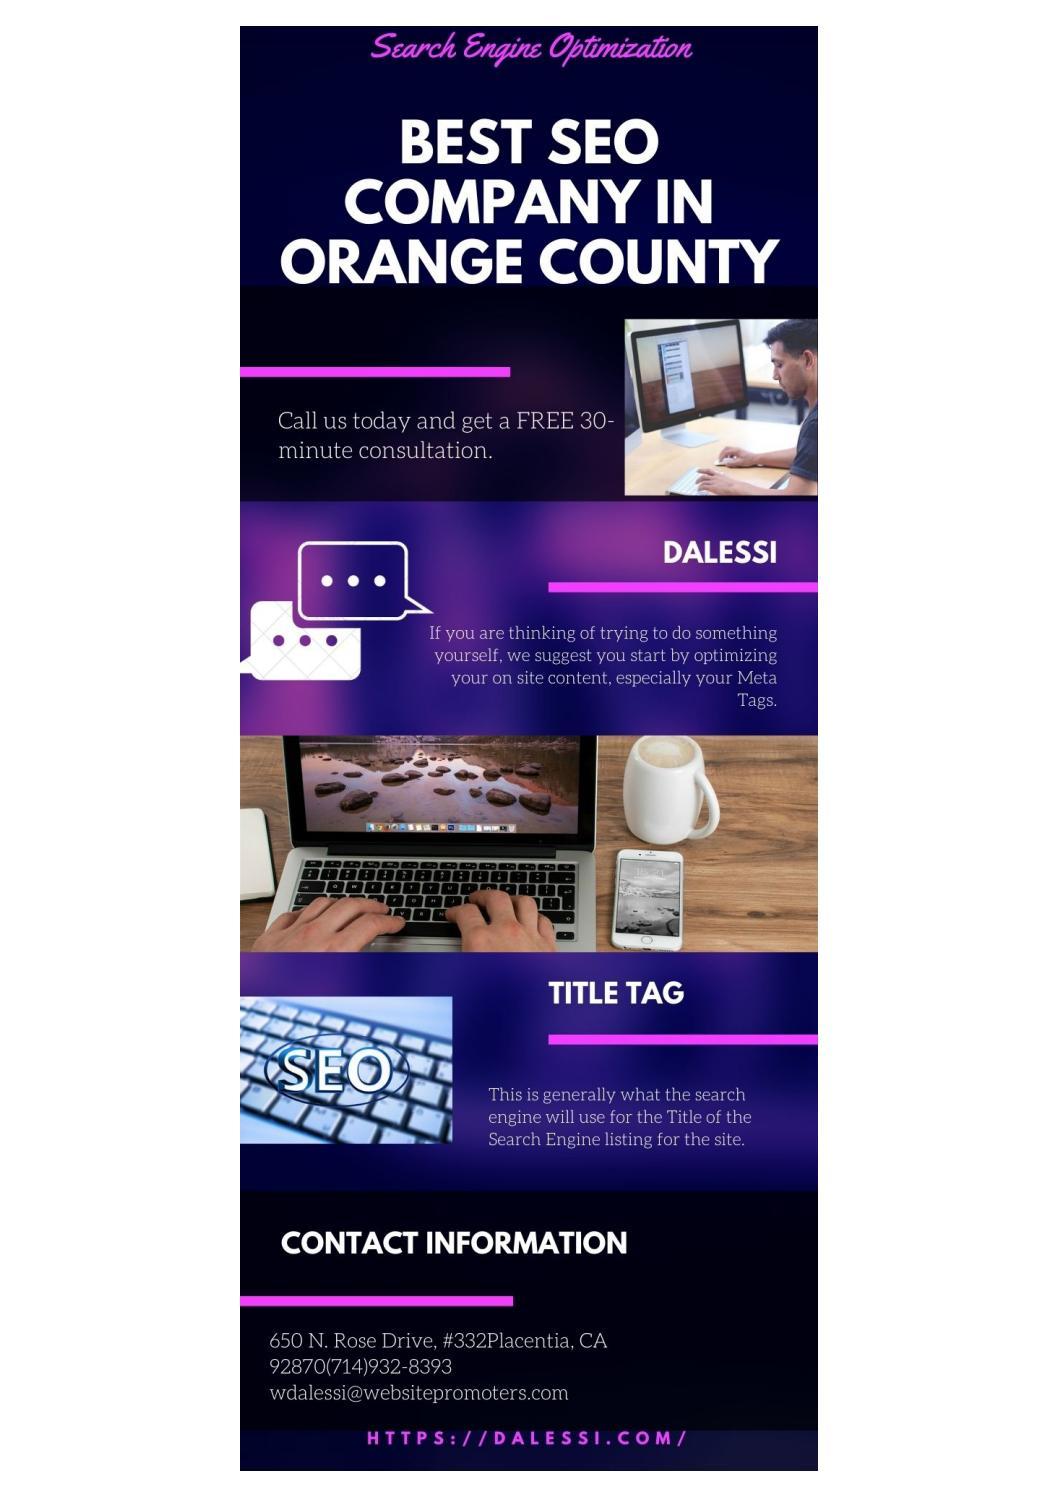 Best Seo Company in Orange County- www.dalessi.com